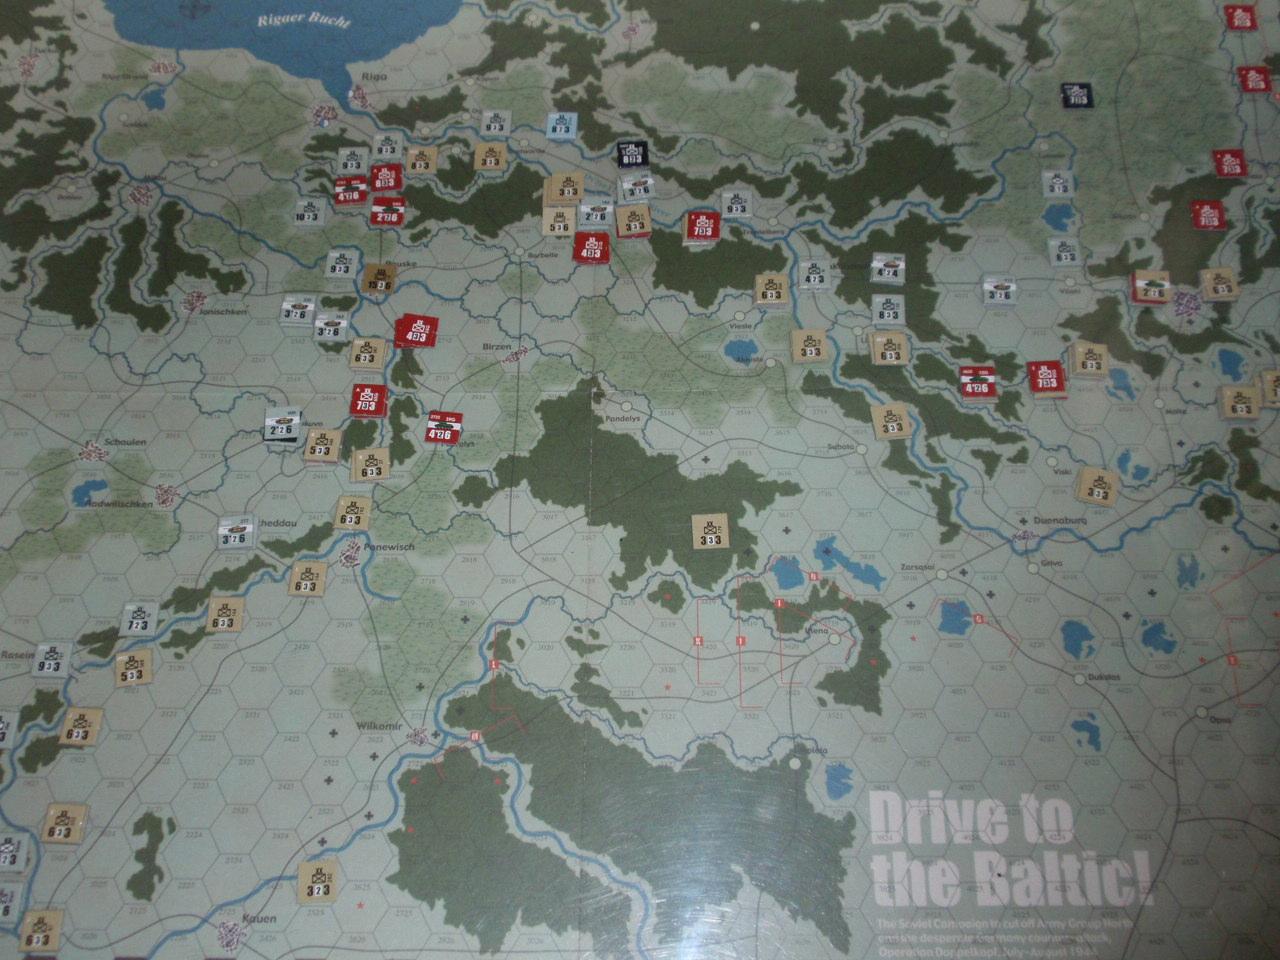 MIH/CMJ「Drive to the Baltic!」をソロプレイ②_b0162202_1926508.jpg